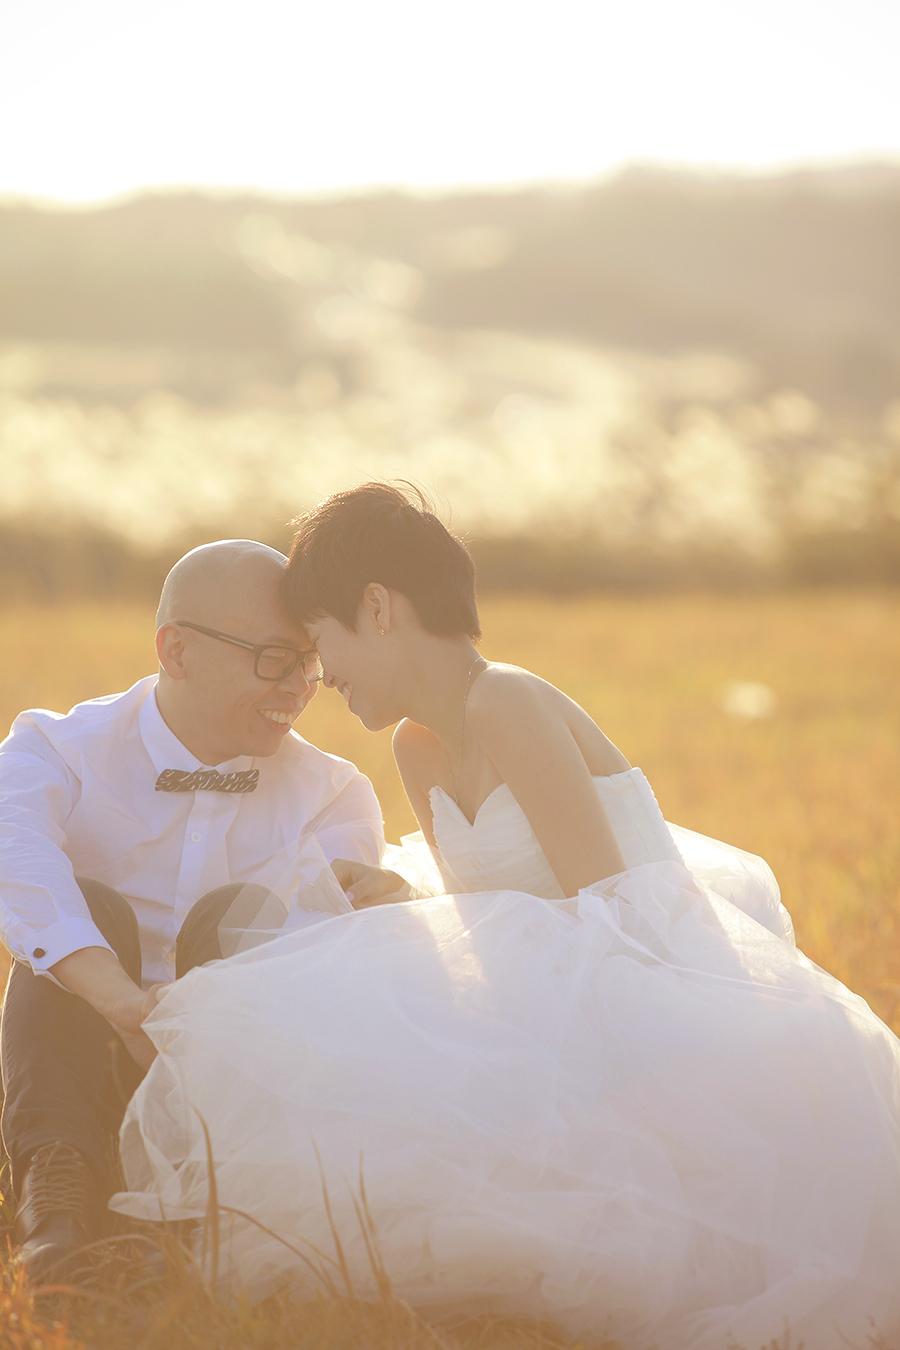 seoul jeju korea . wedding photography by kurt ahs . steve+chloe . 8061.jpg